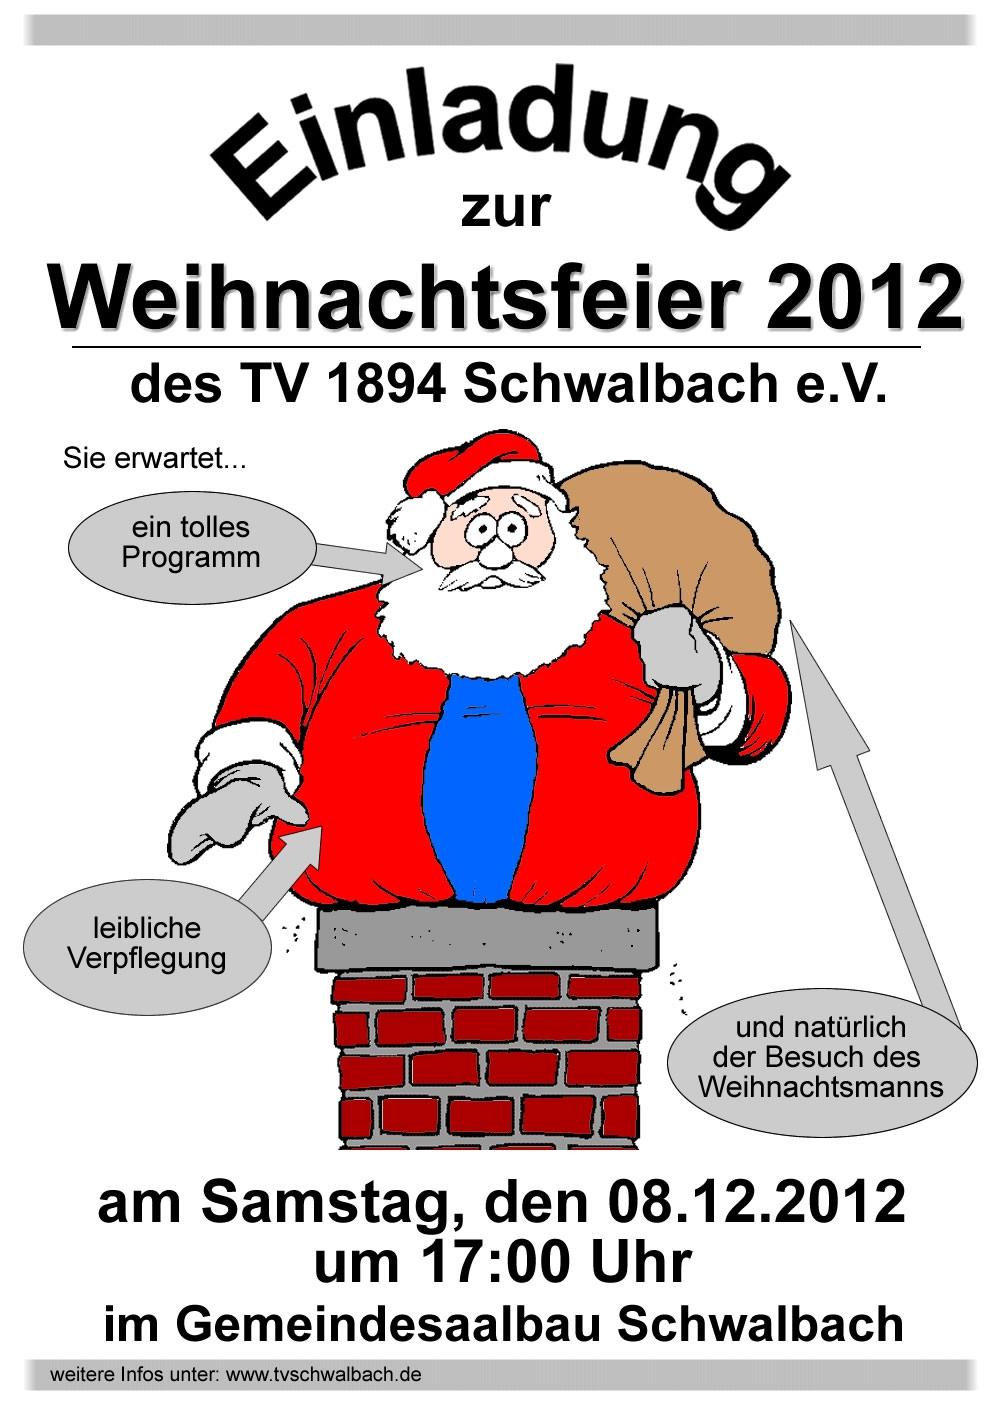 weihnachtsfeier 2012 tv 1894 schwalbach e v. Black Bedroom Furniture Sets. Home Design Ideas